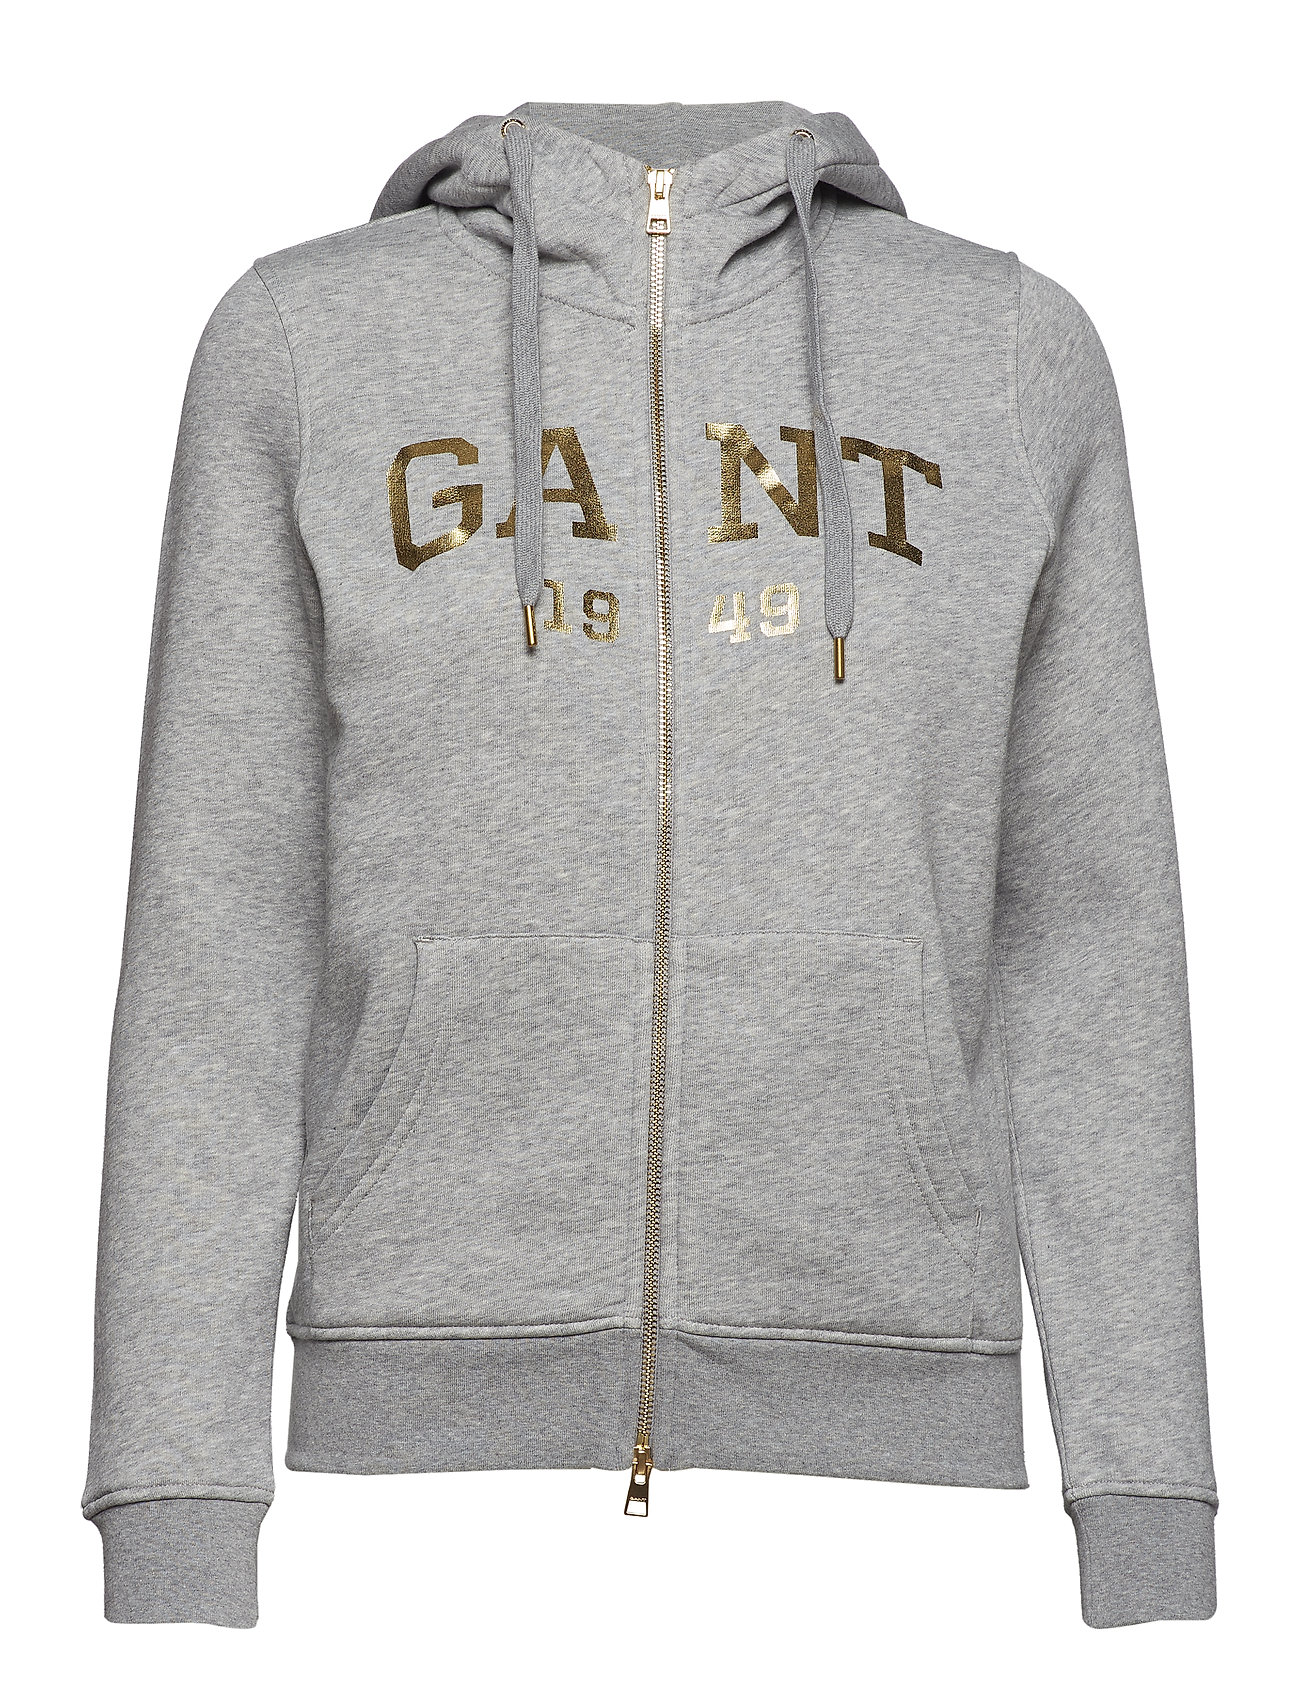 GANT O2. GIFT GIVING FULL ZIP HOODIE